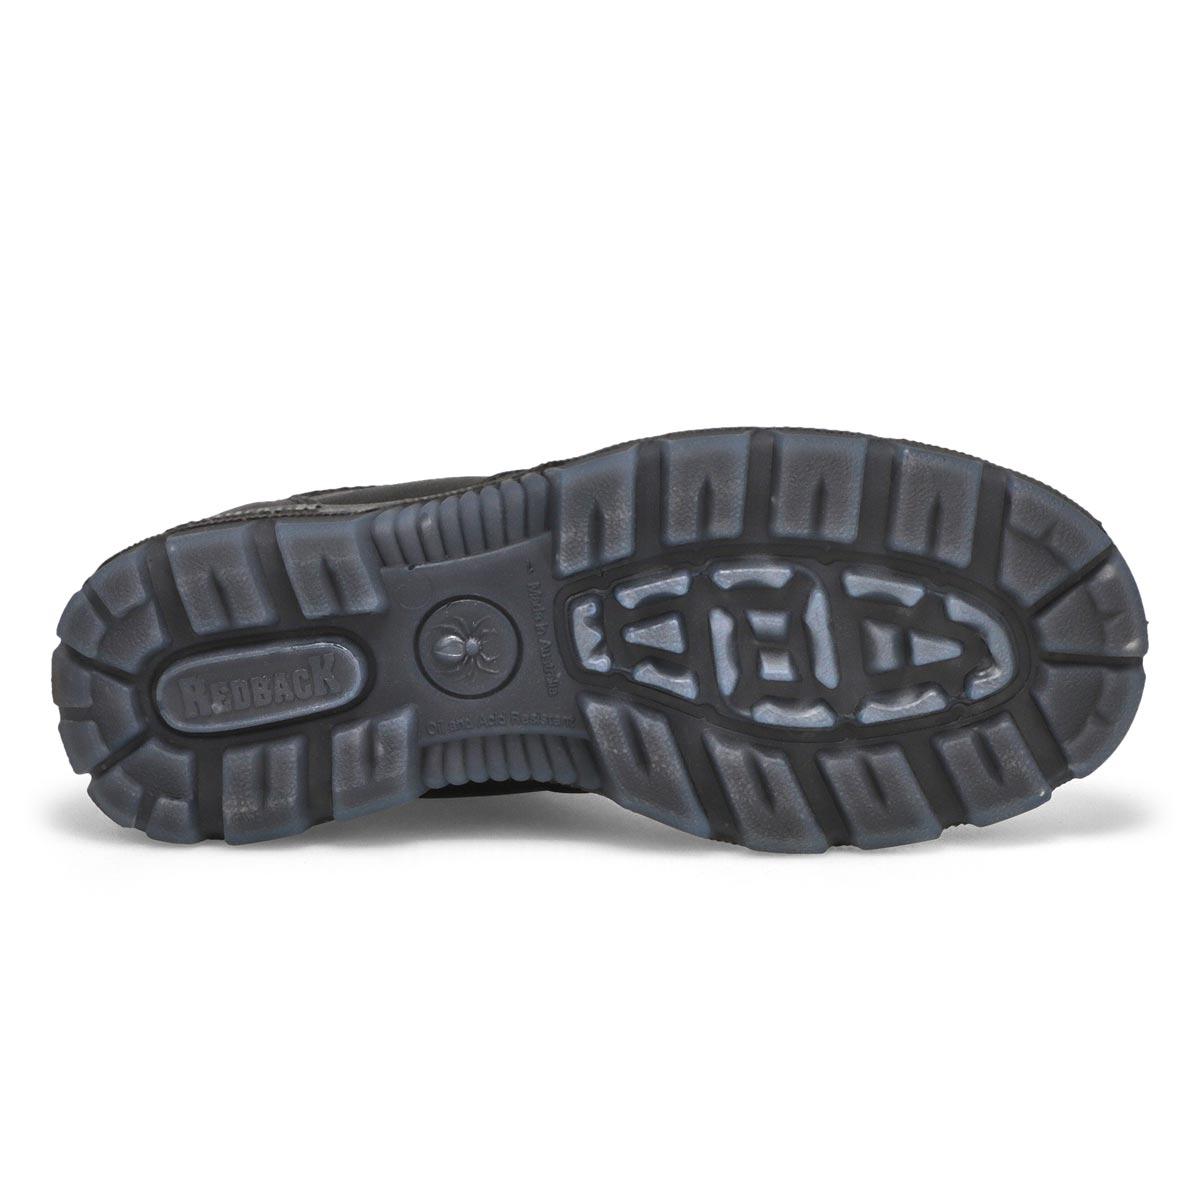 Unisex Bobcat black leather pull on boot